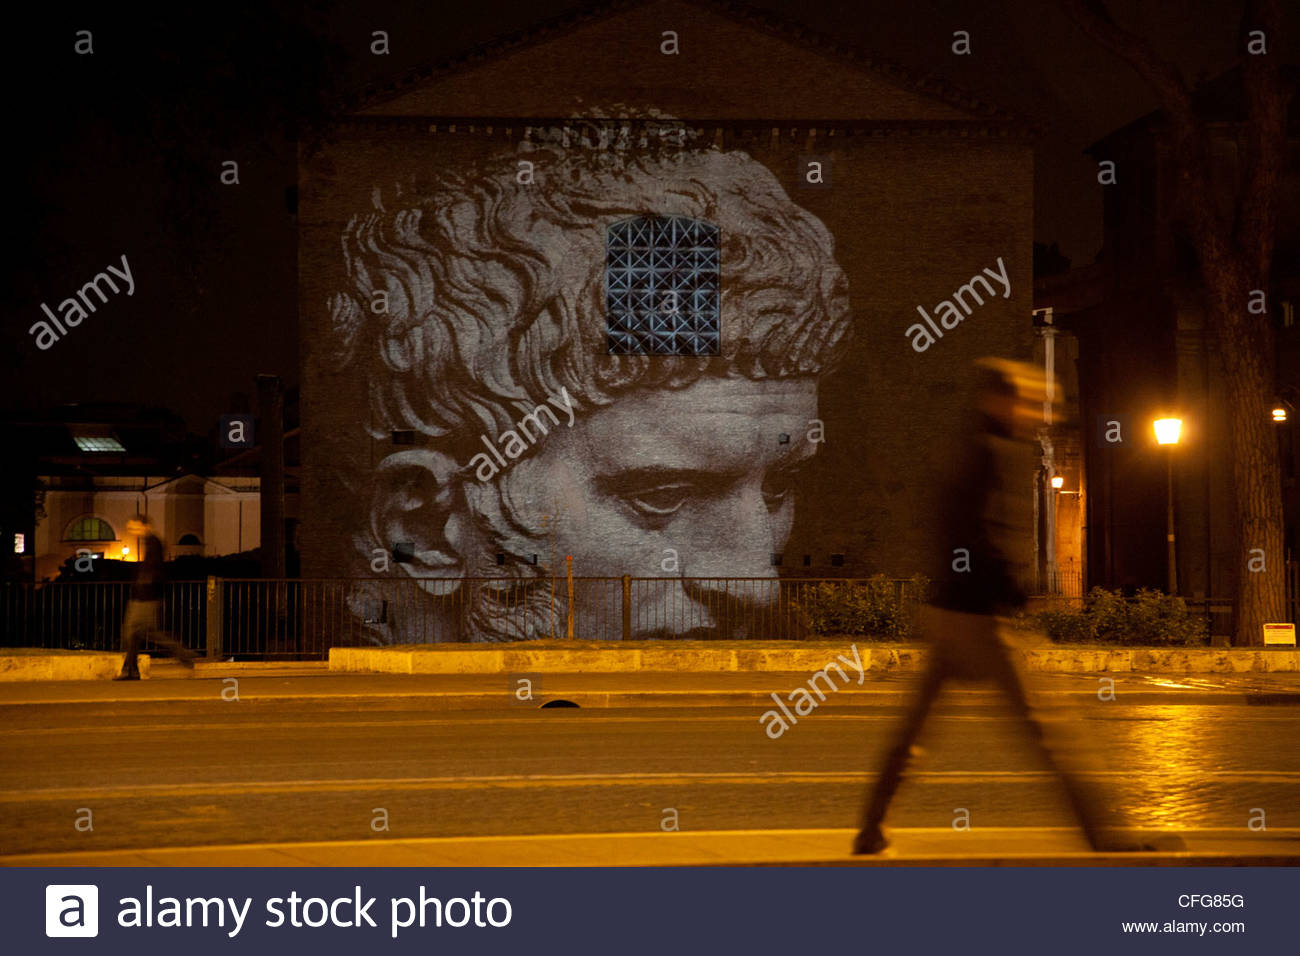 Pedestrians underneath a projection of Julius Caesar on a rainy night. - Stock Image